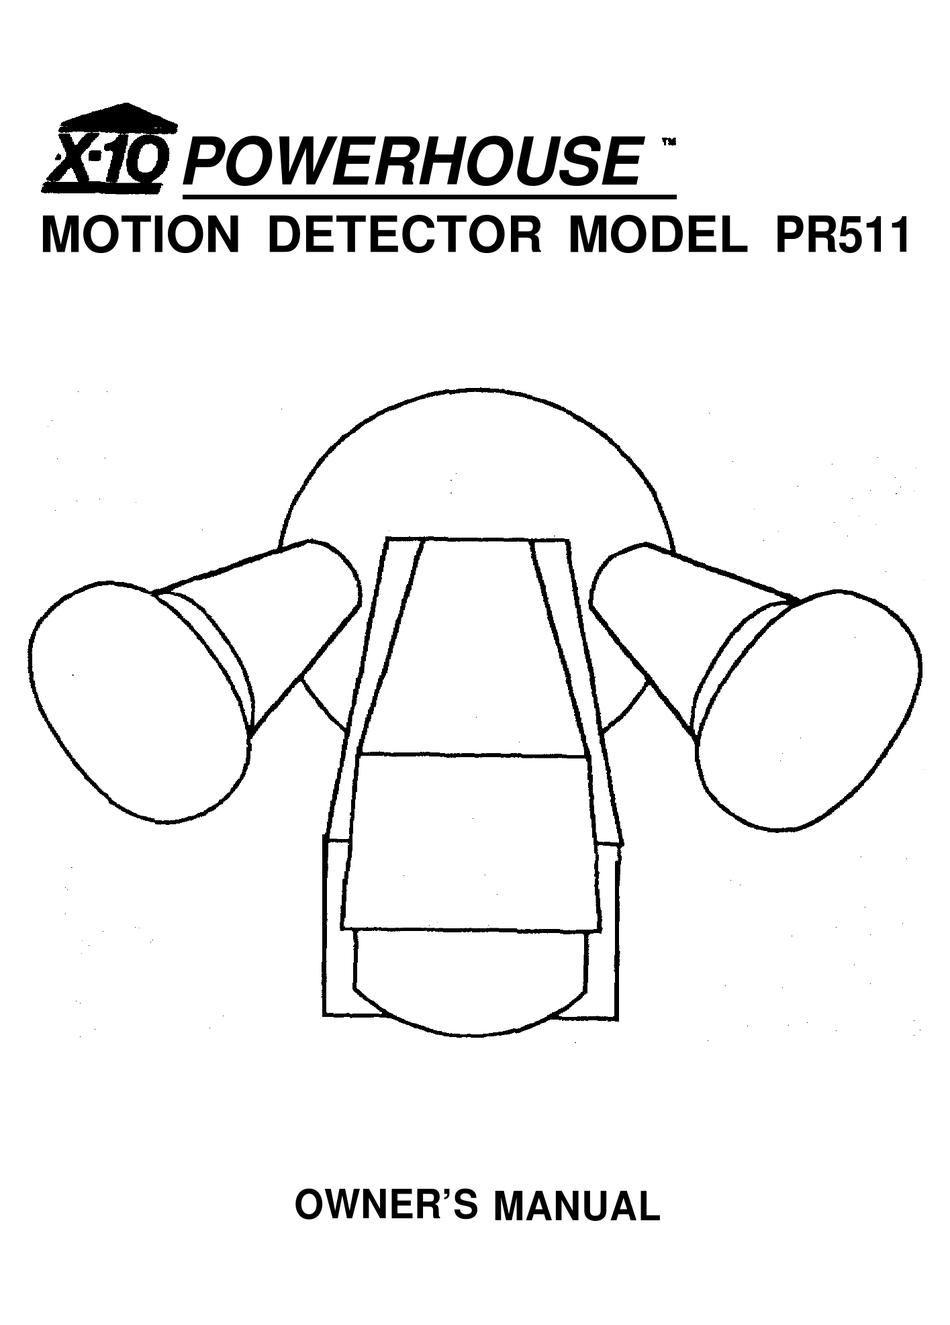 X10 PR511 OWNER'S MANUAL Pdf Download | ManualsLib | X 10 Motion Detector Wiring Diagram |  | ManualsLib